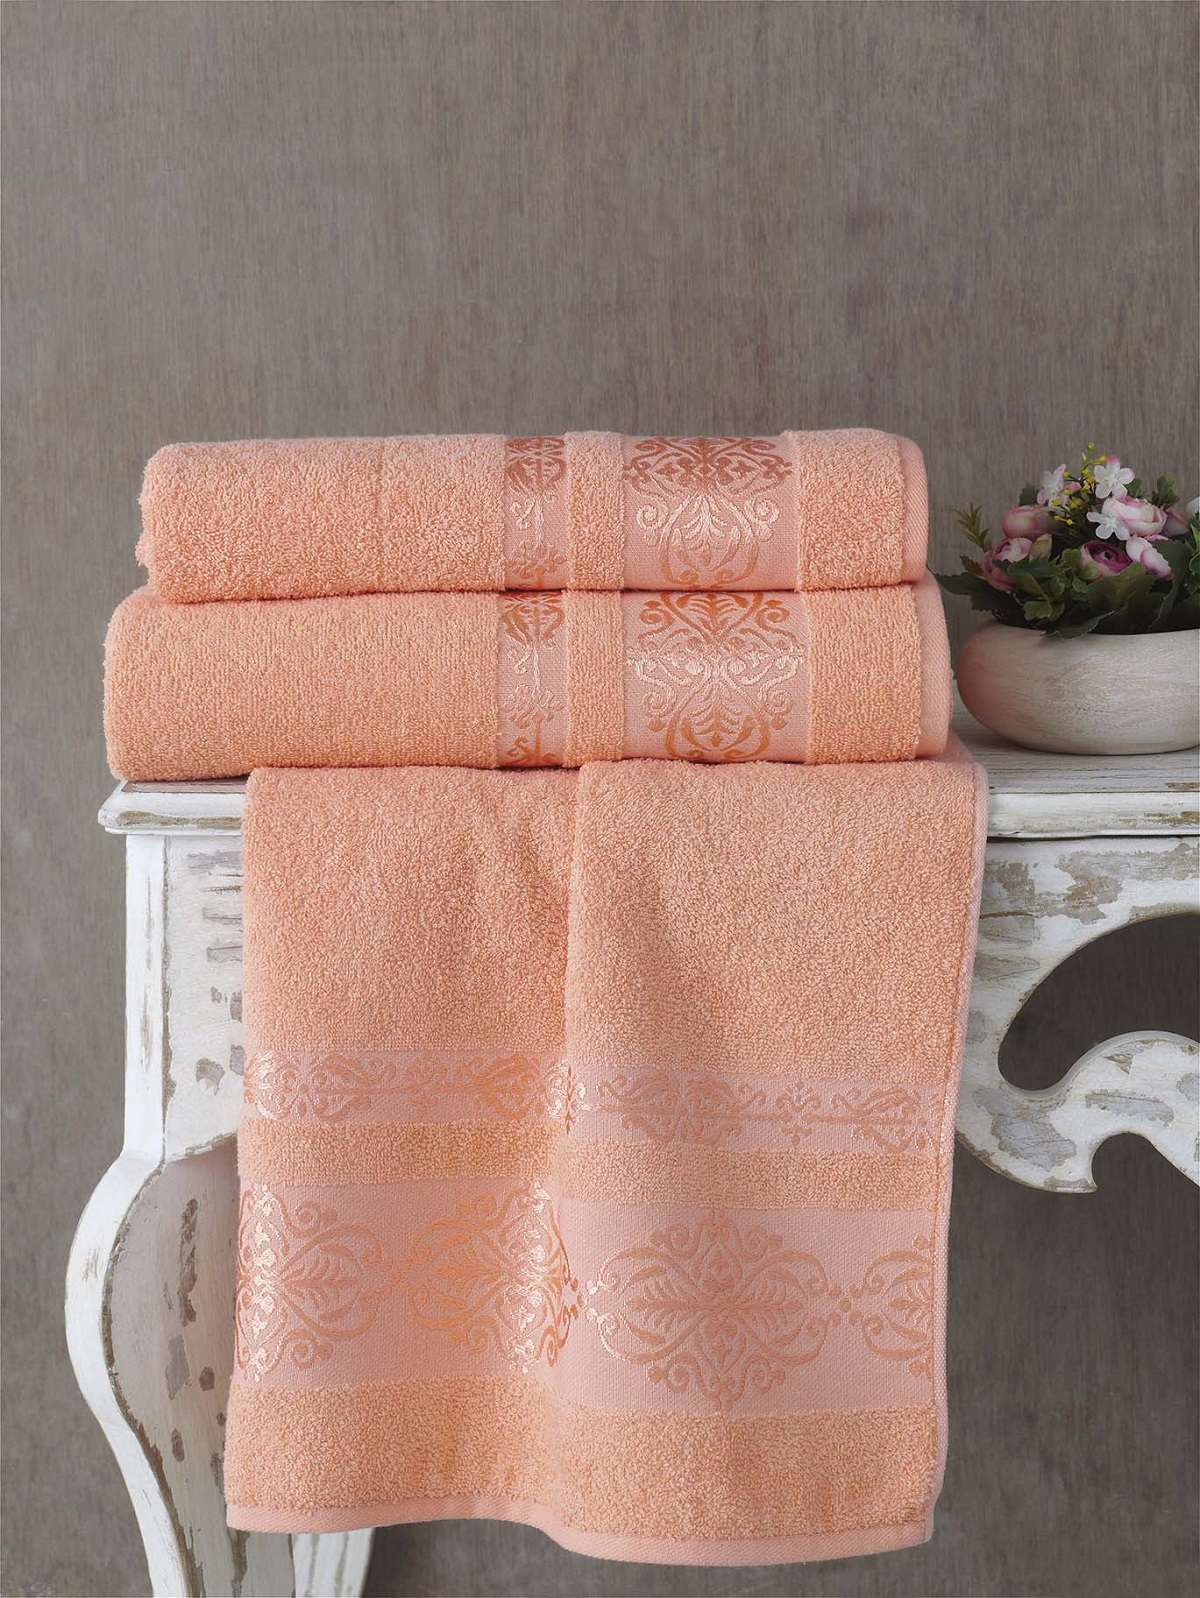 Полотенца Karna Полотенце Rebeka Цвет: Абрикосовый (70х140 см) karna karna полотенце innes цвет красный 70х140 см